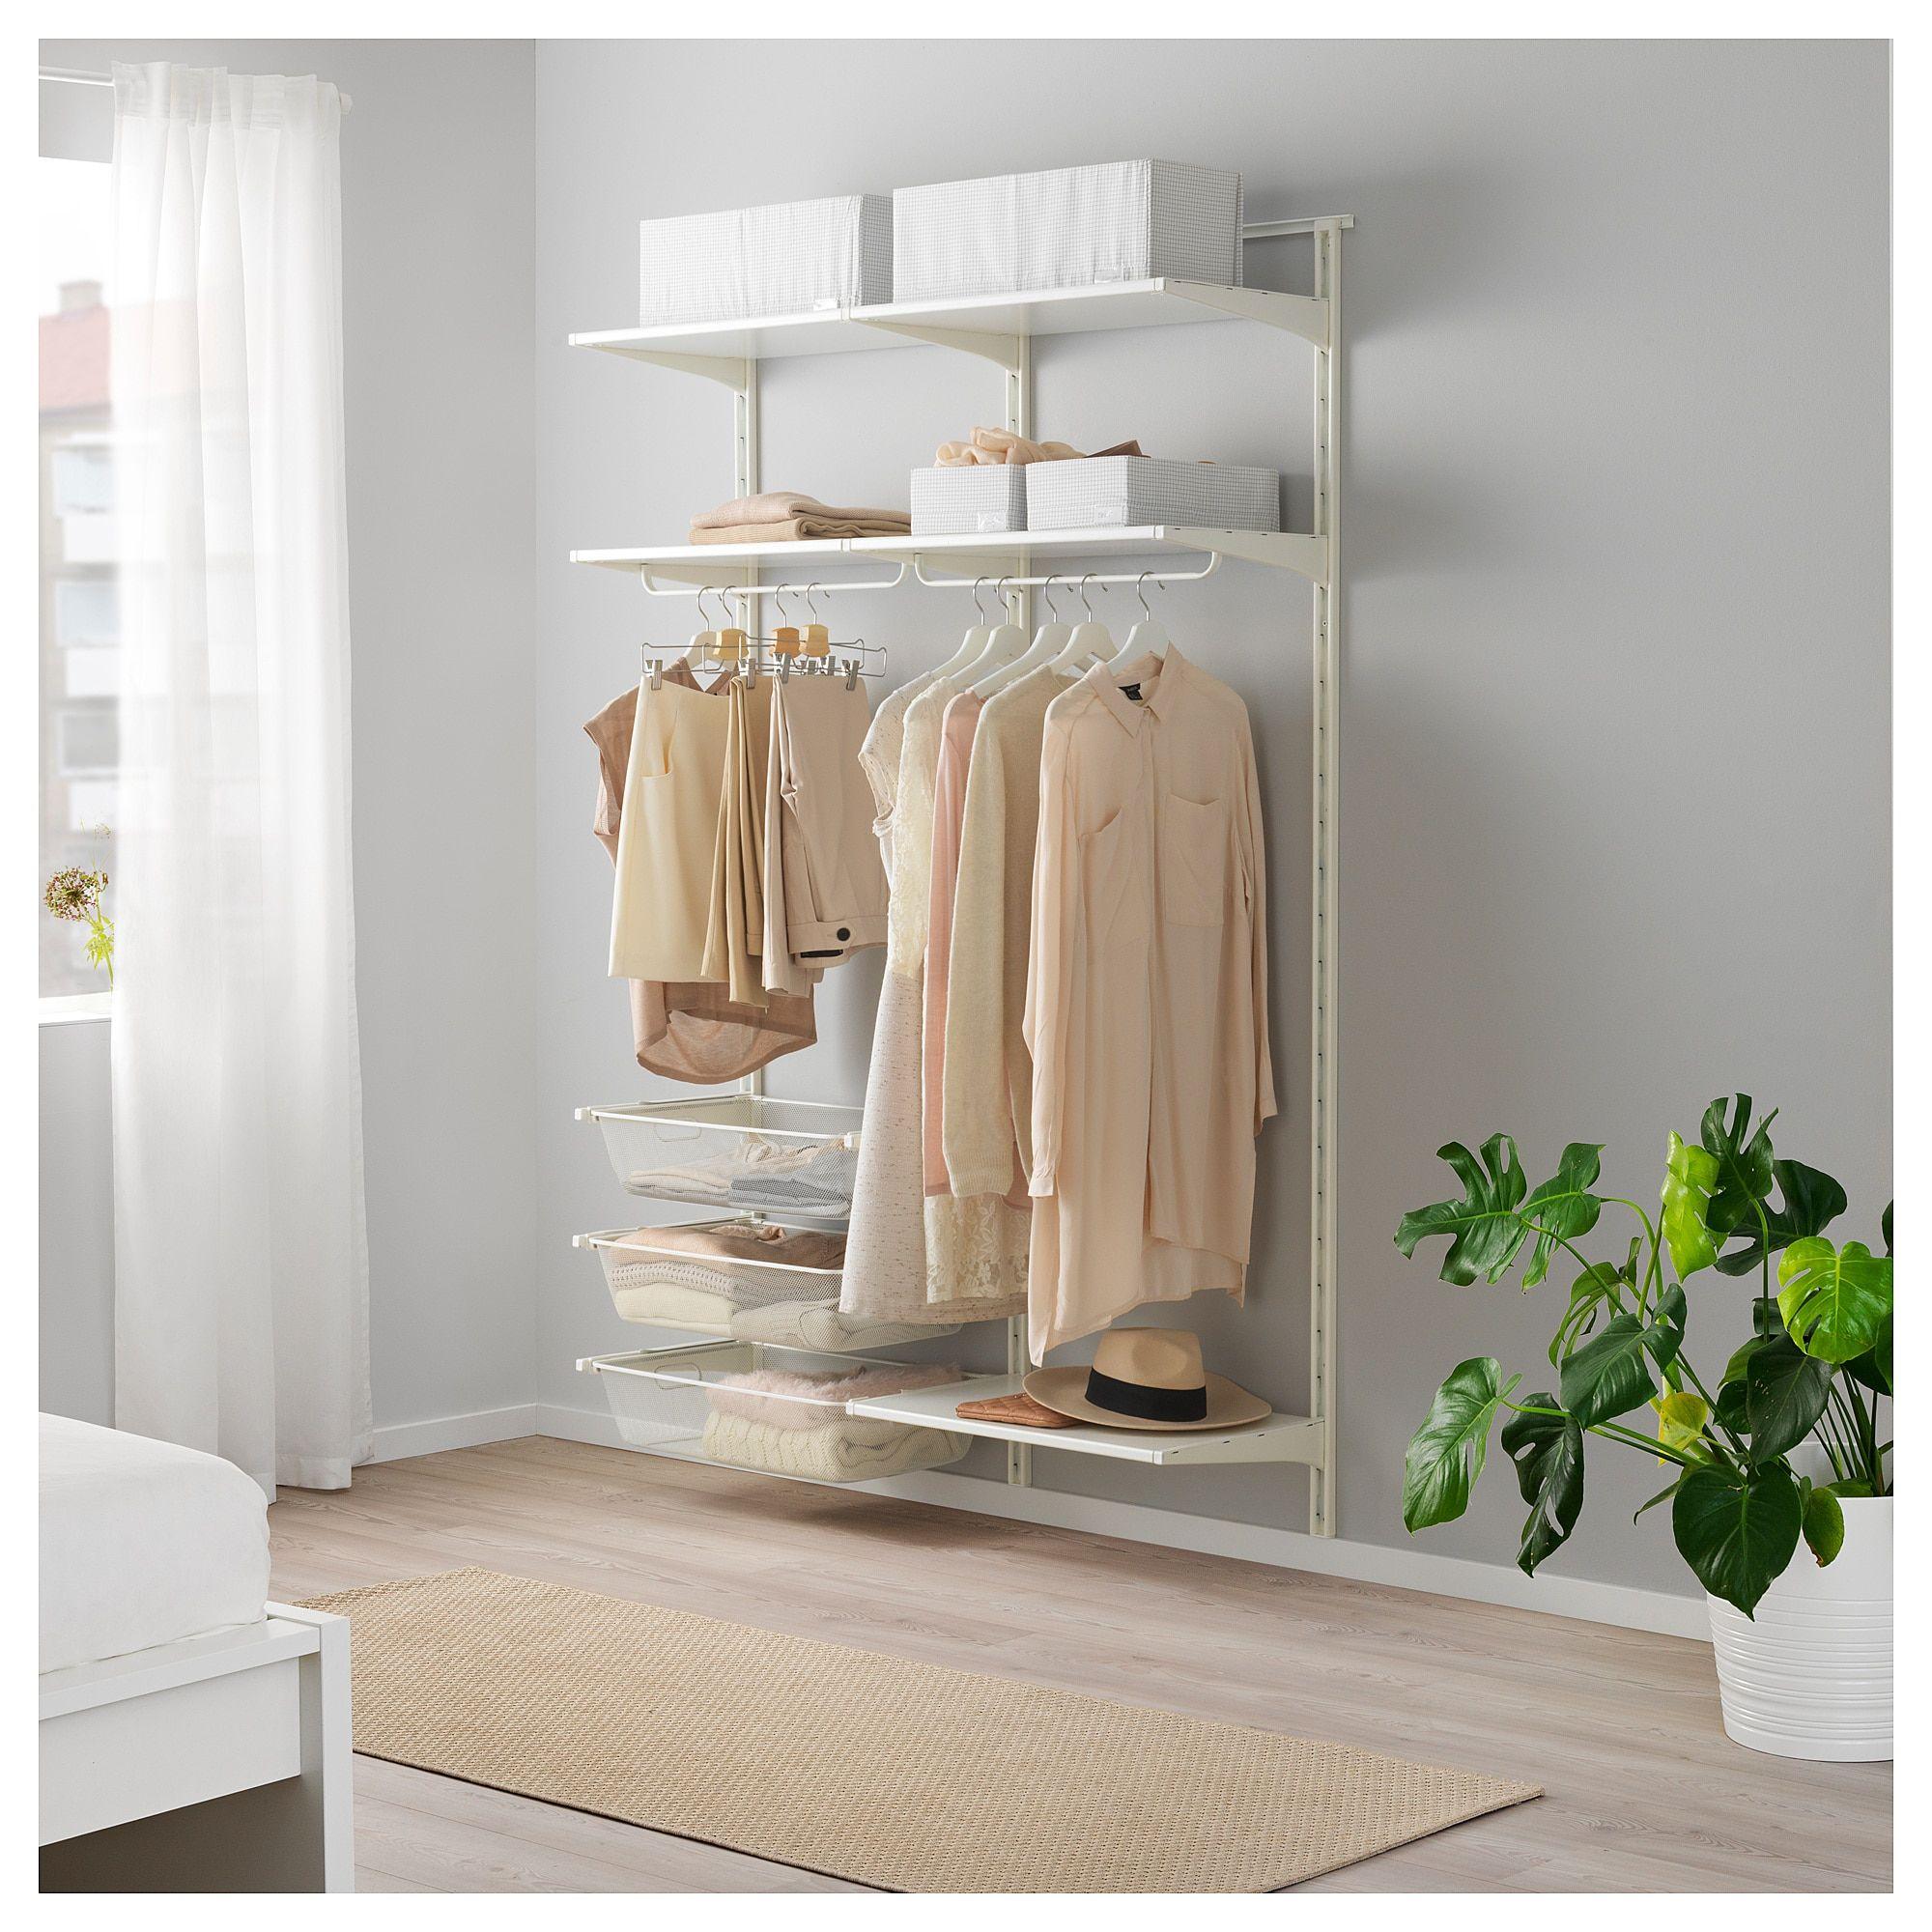 Tringle Armoire Ikea - almoire